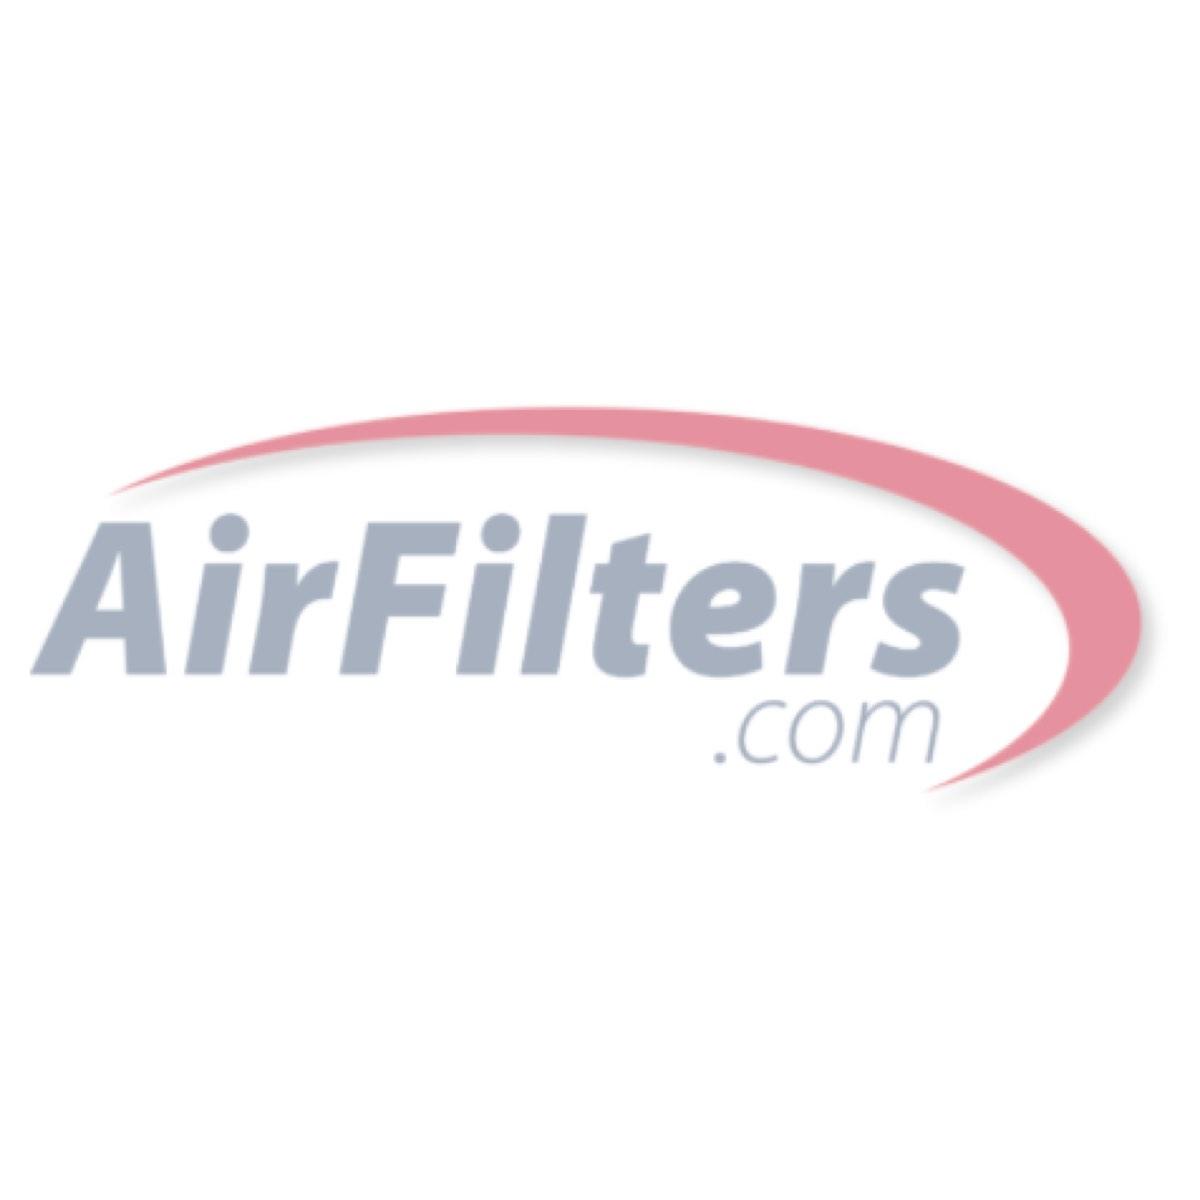 Carrier® FILCCCAR0020 Filters (20x25x5 - 19.88x24.75x4.38) by Accumulair®